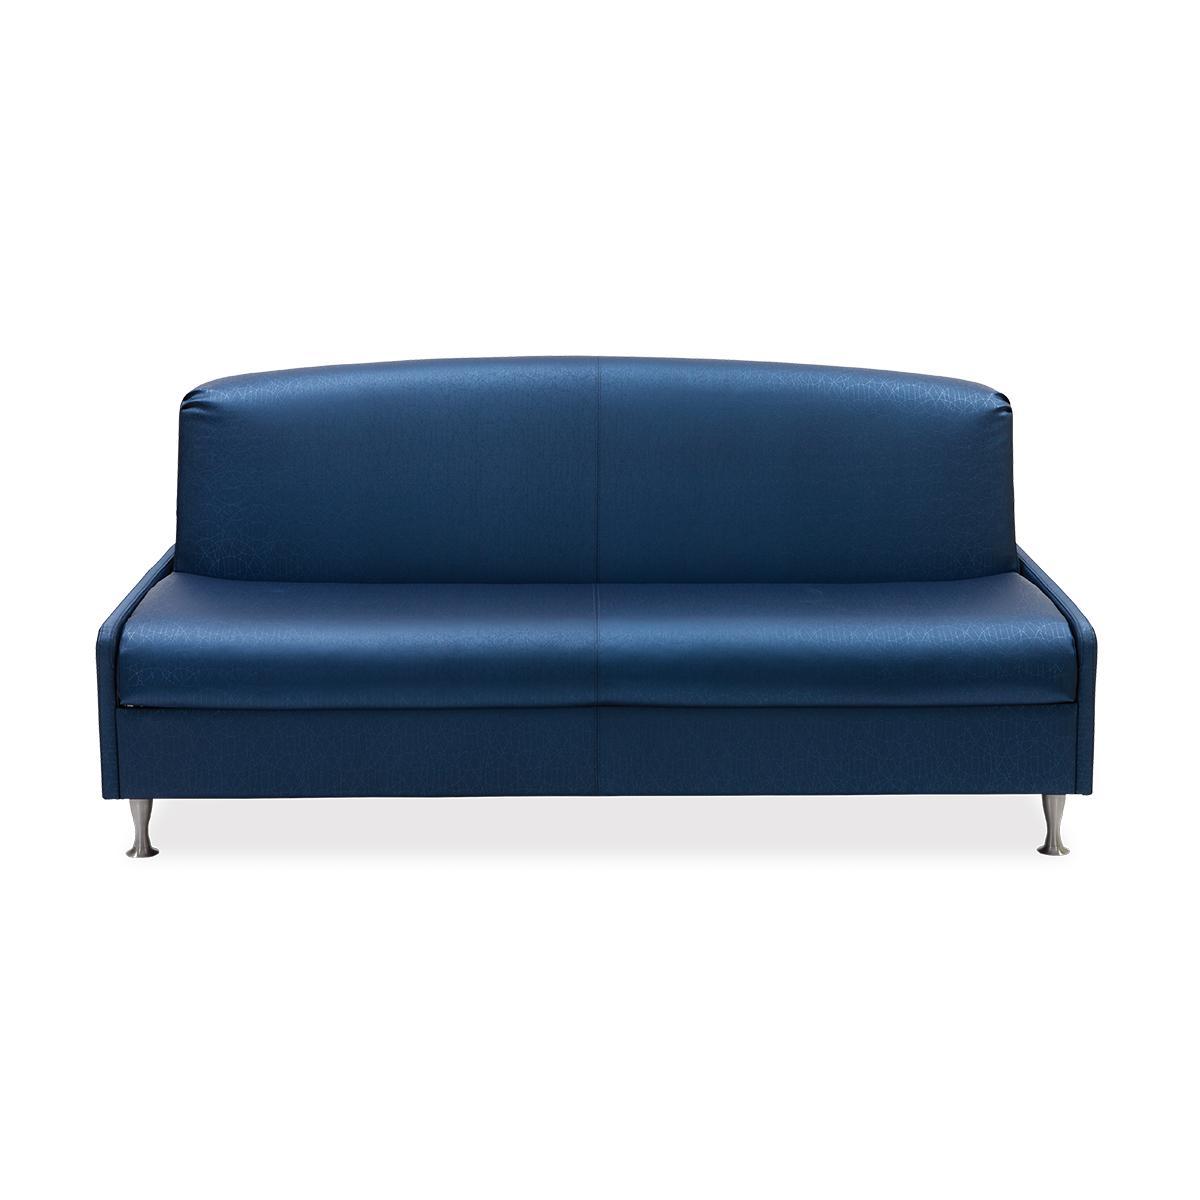 Perinatal Furniture, modern, trim line sleeper couch, blue, straight on